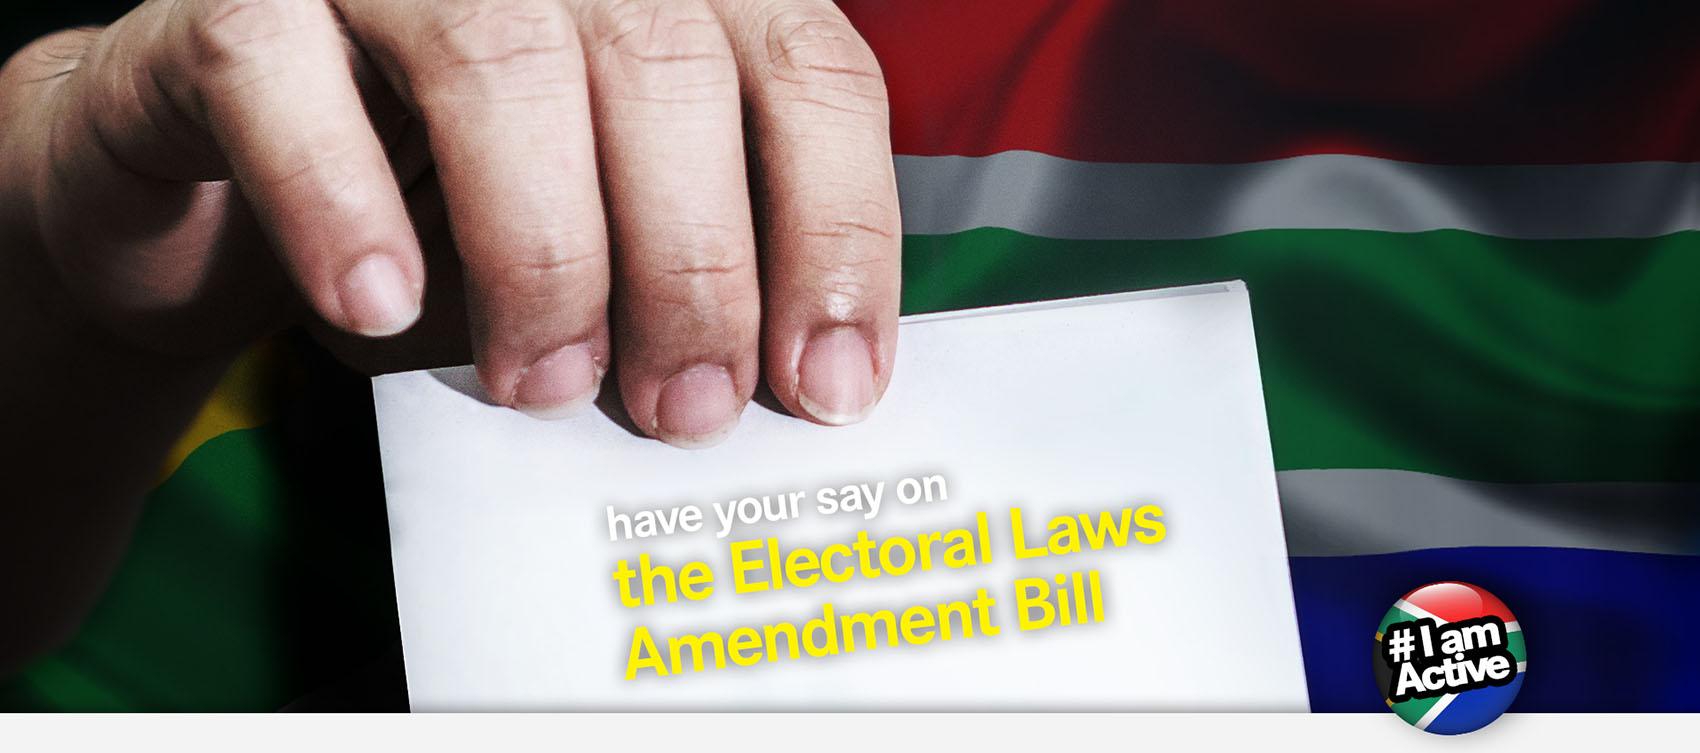 DearSA-Electoral-Laws-Amendment-Bill2